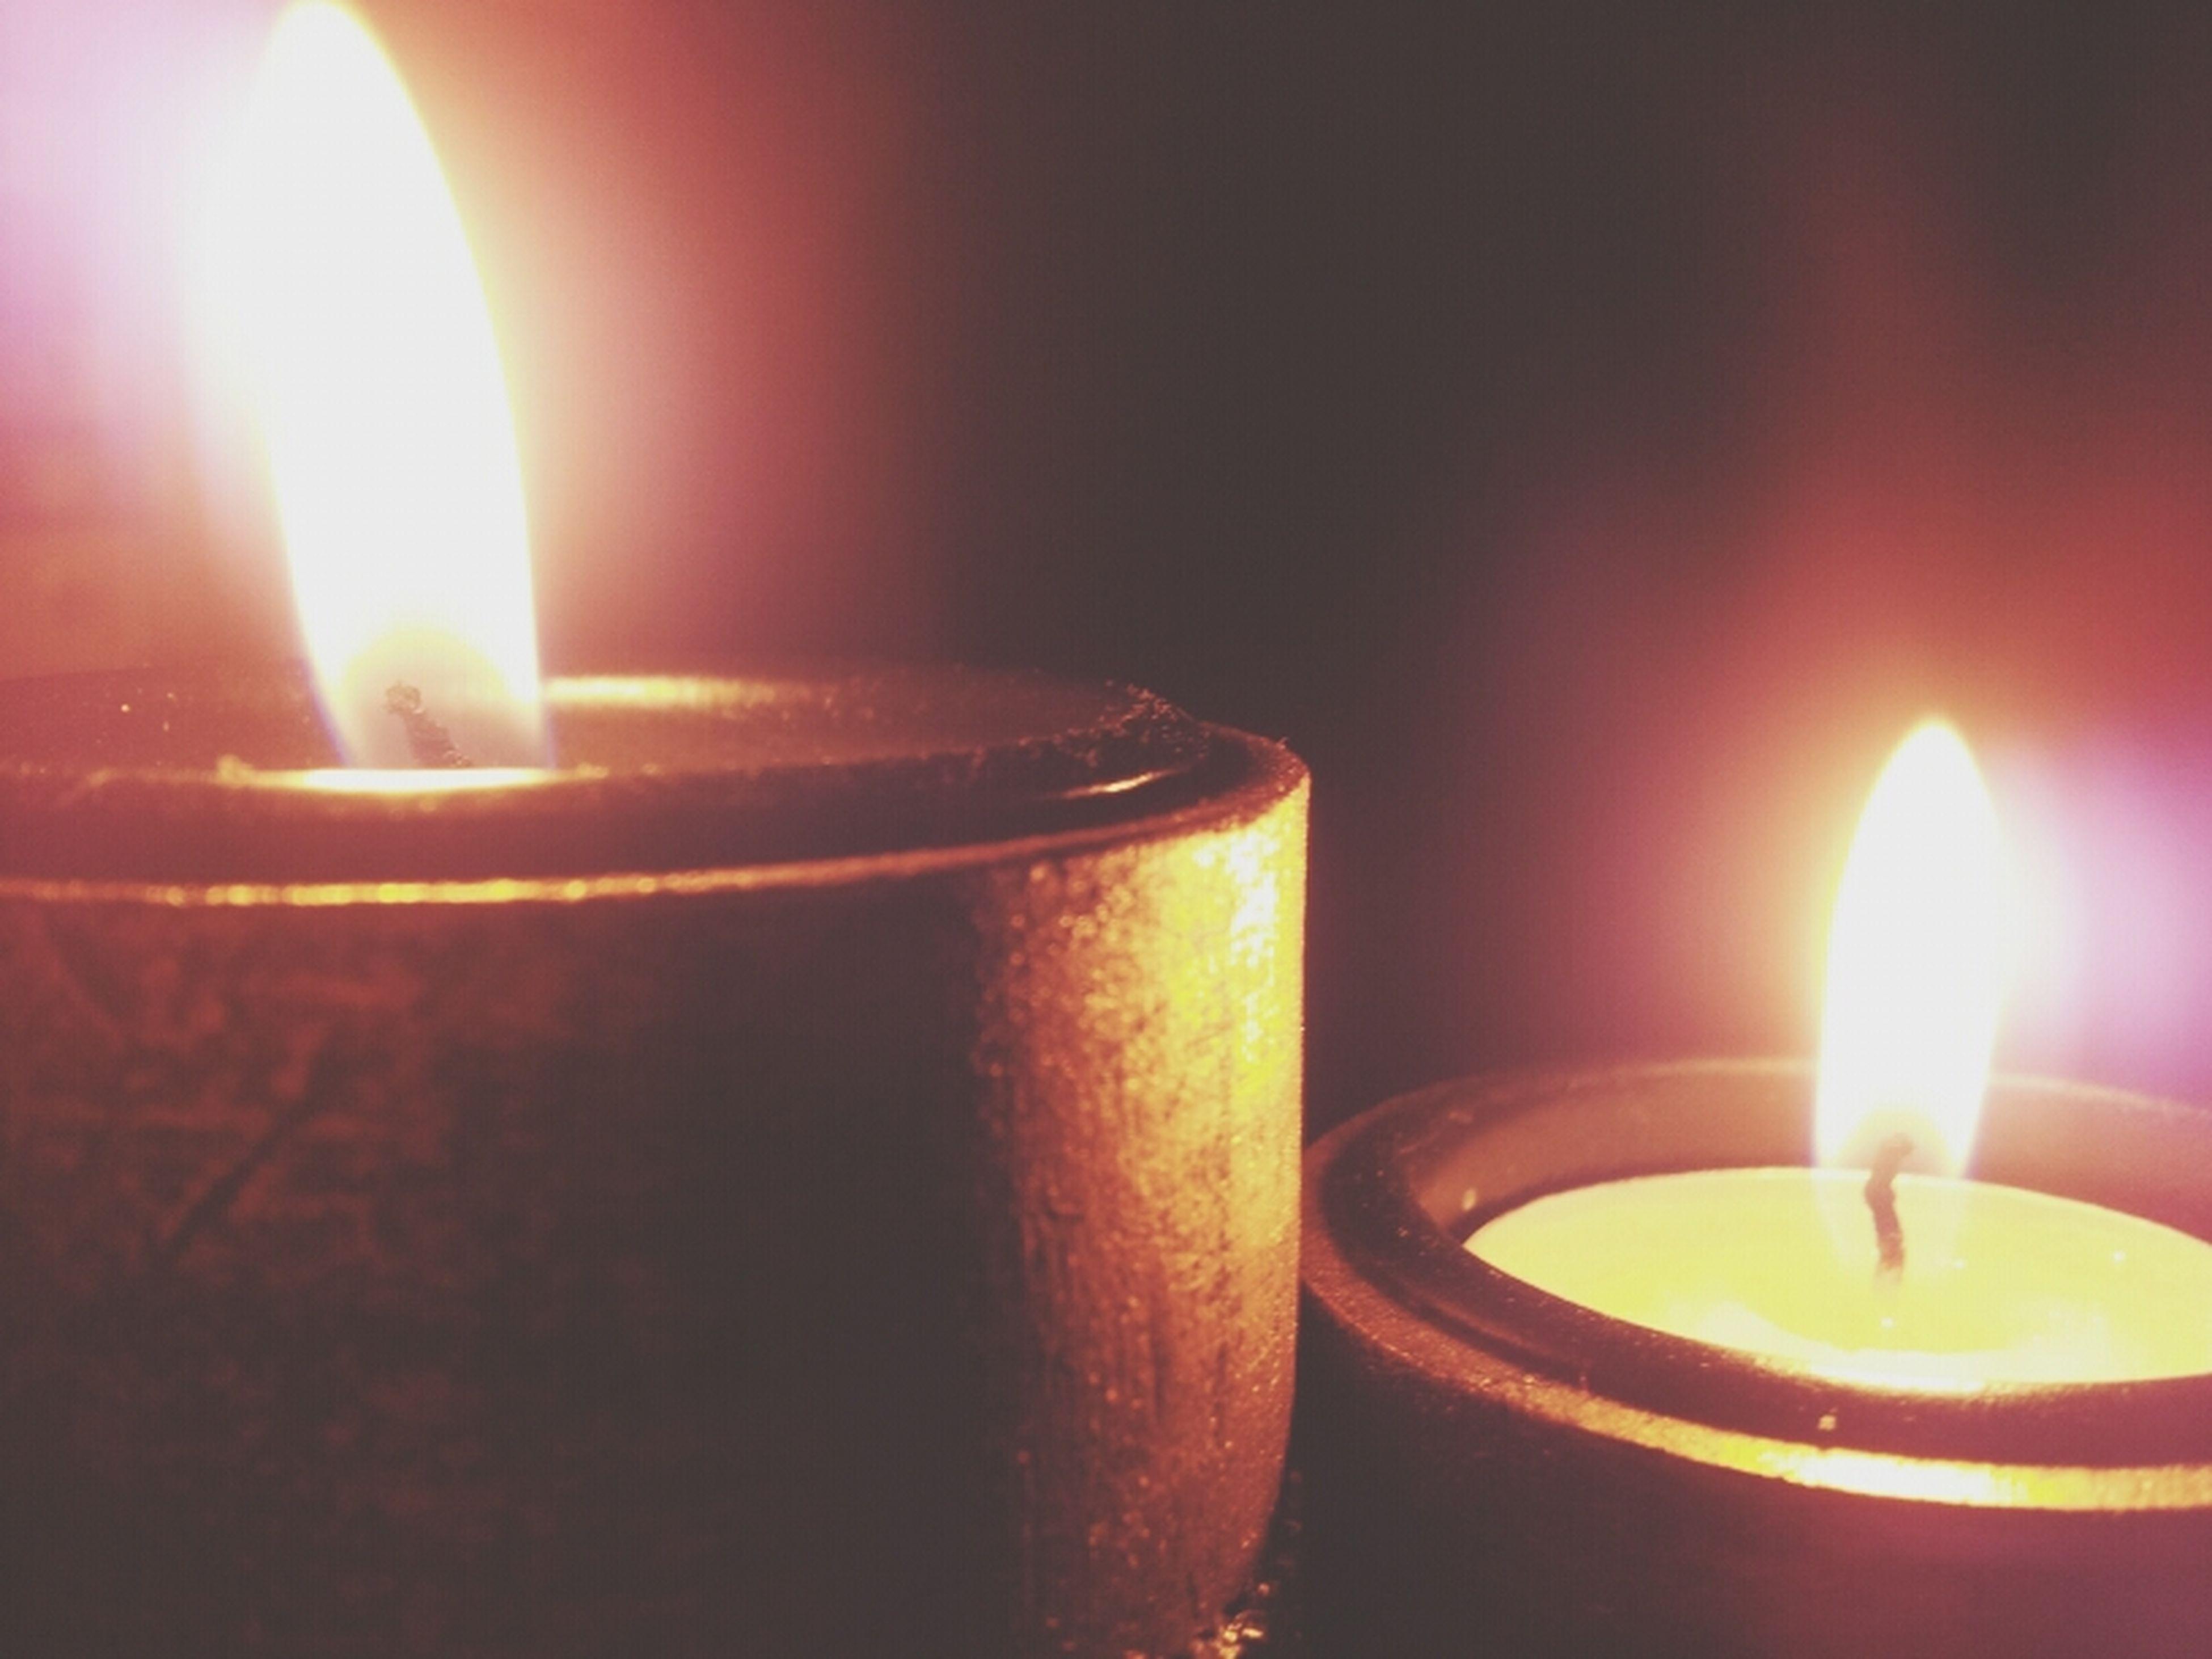 flame, burning, heat - temperature, glowing, candle, fire - natural phenomenon, illuminated, indoors, close-up, lit, candlelight, light - natural phenomenon, fire, still life, orange color, no people, tea light, lighting equipment, dark, focus on foreground